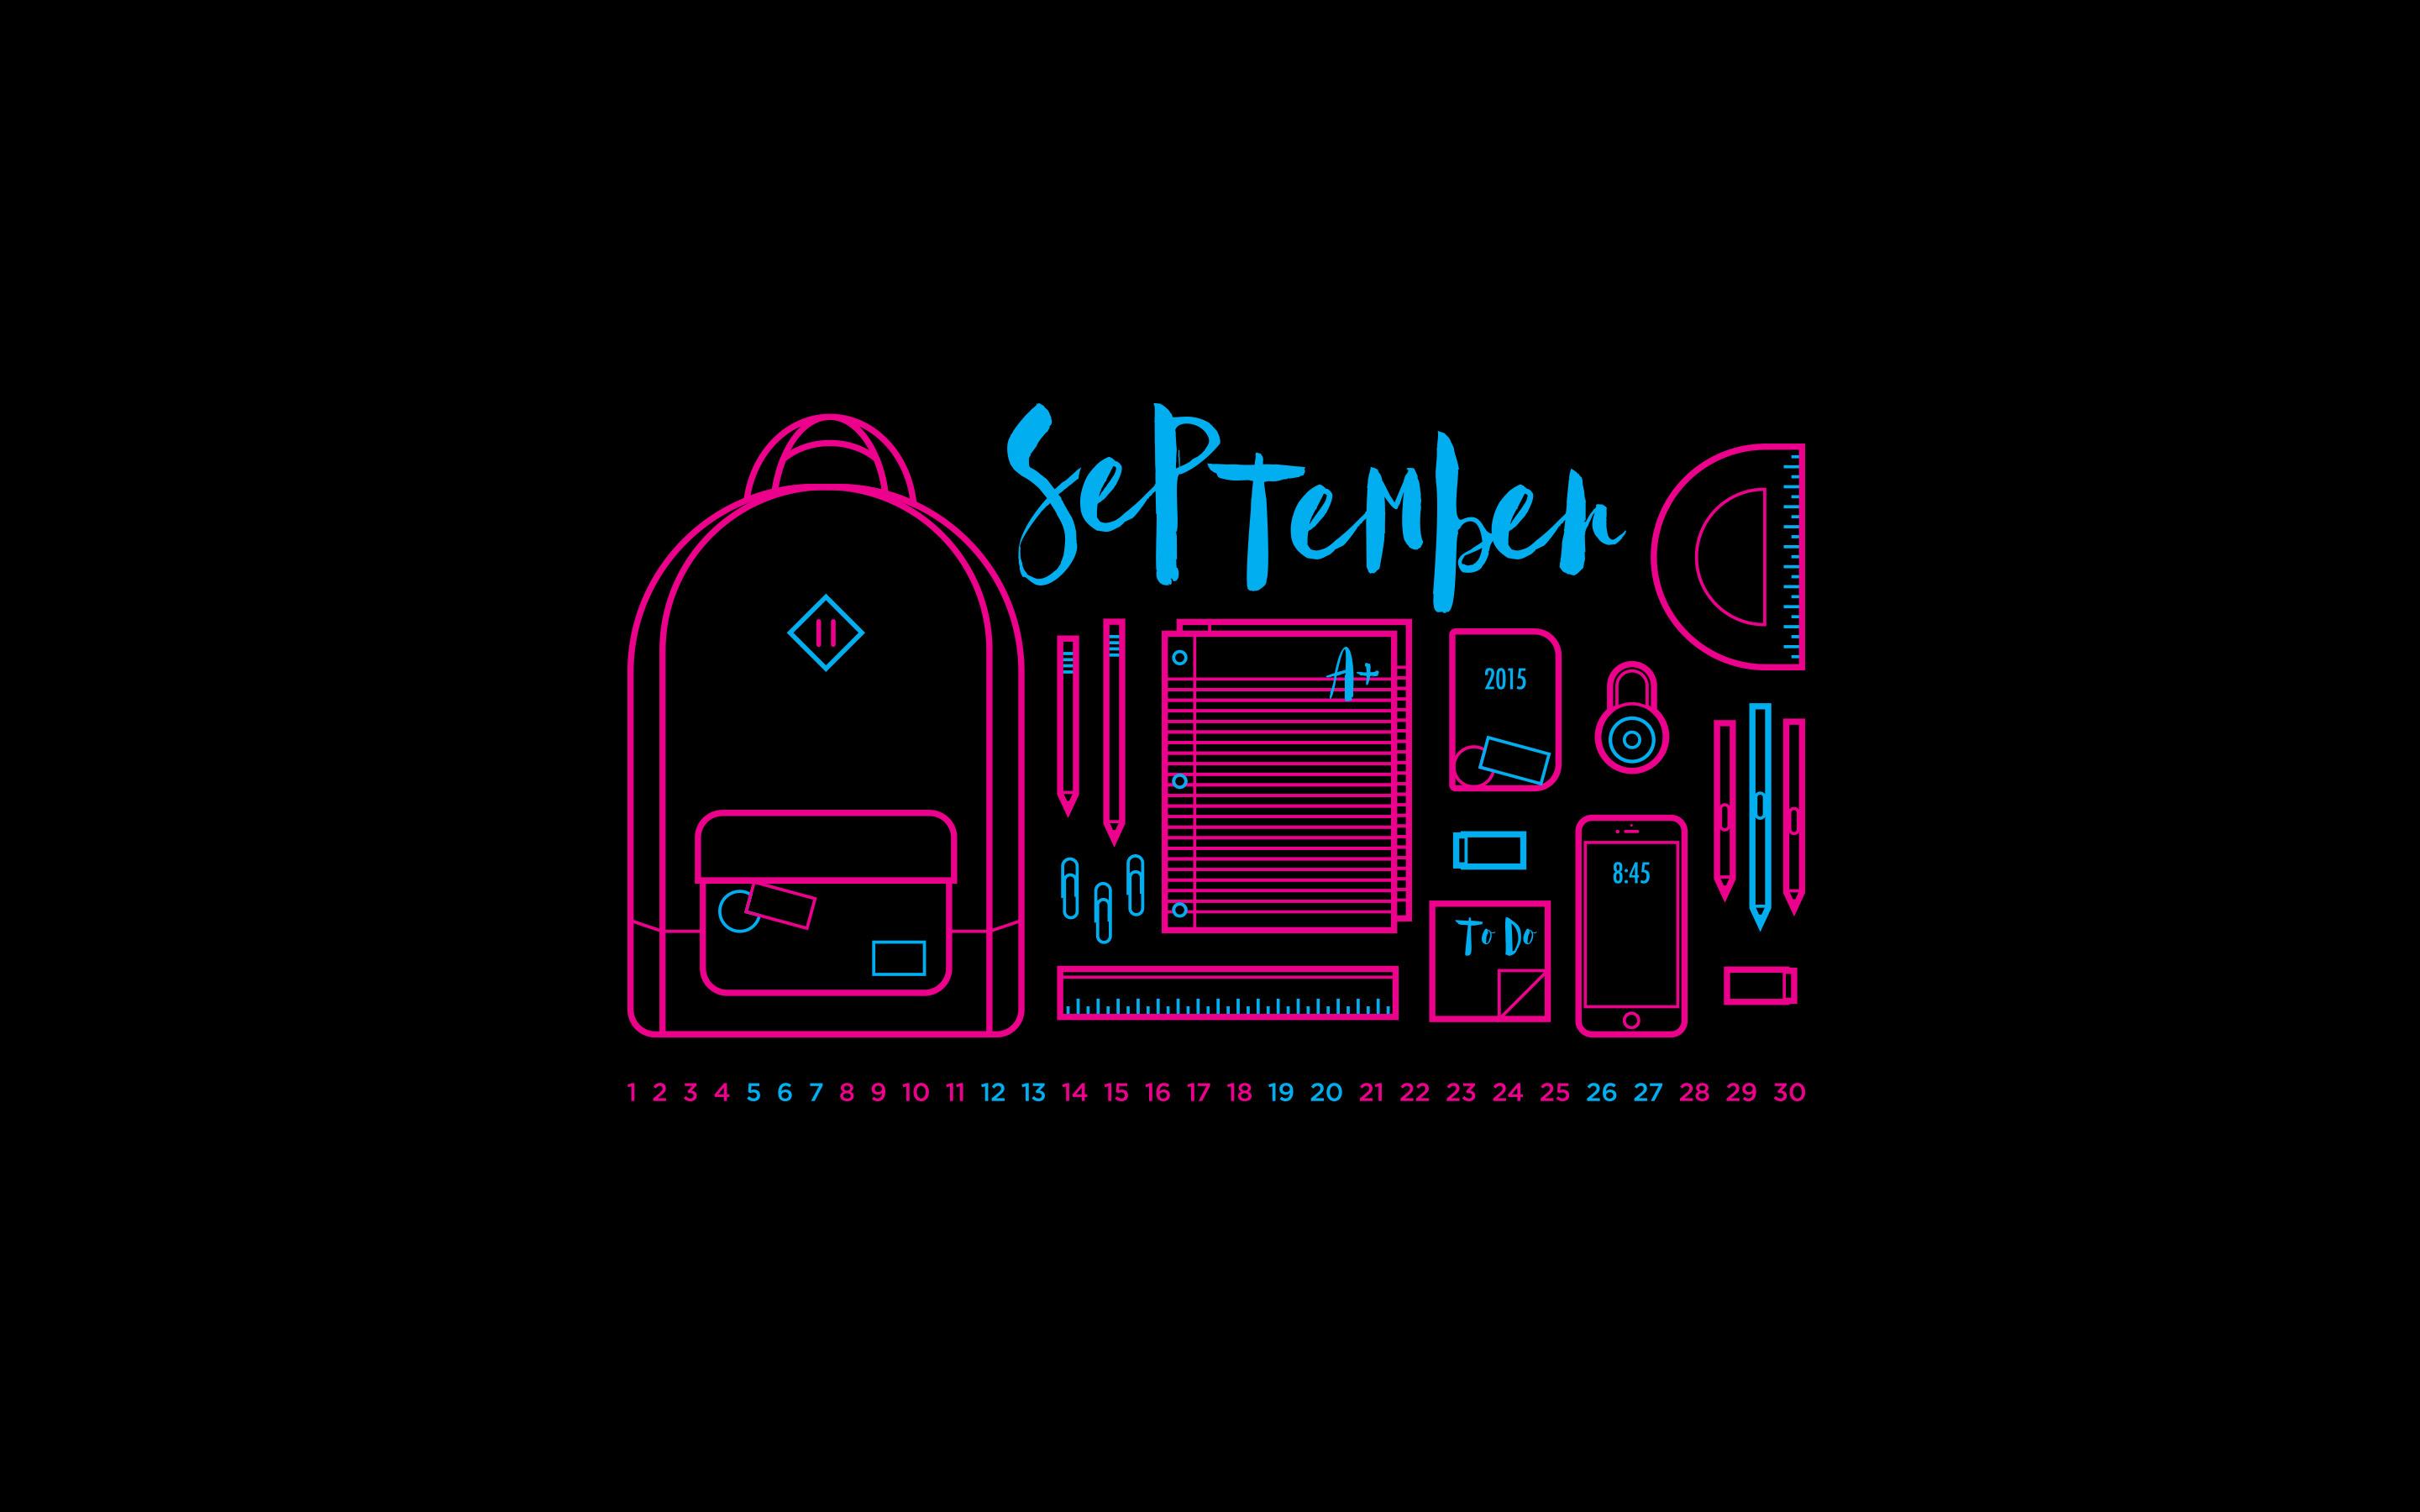 September 2015 Desktop Calendar Wallpaper Paper Leaf 2881x1800